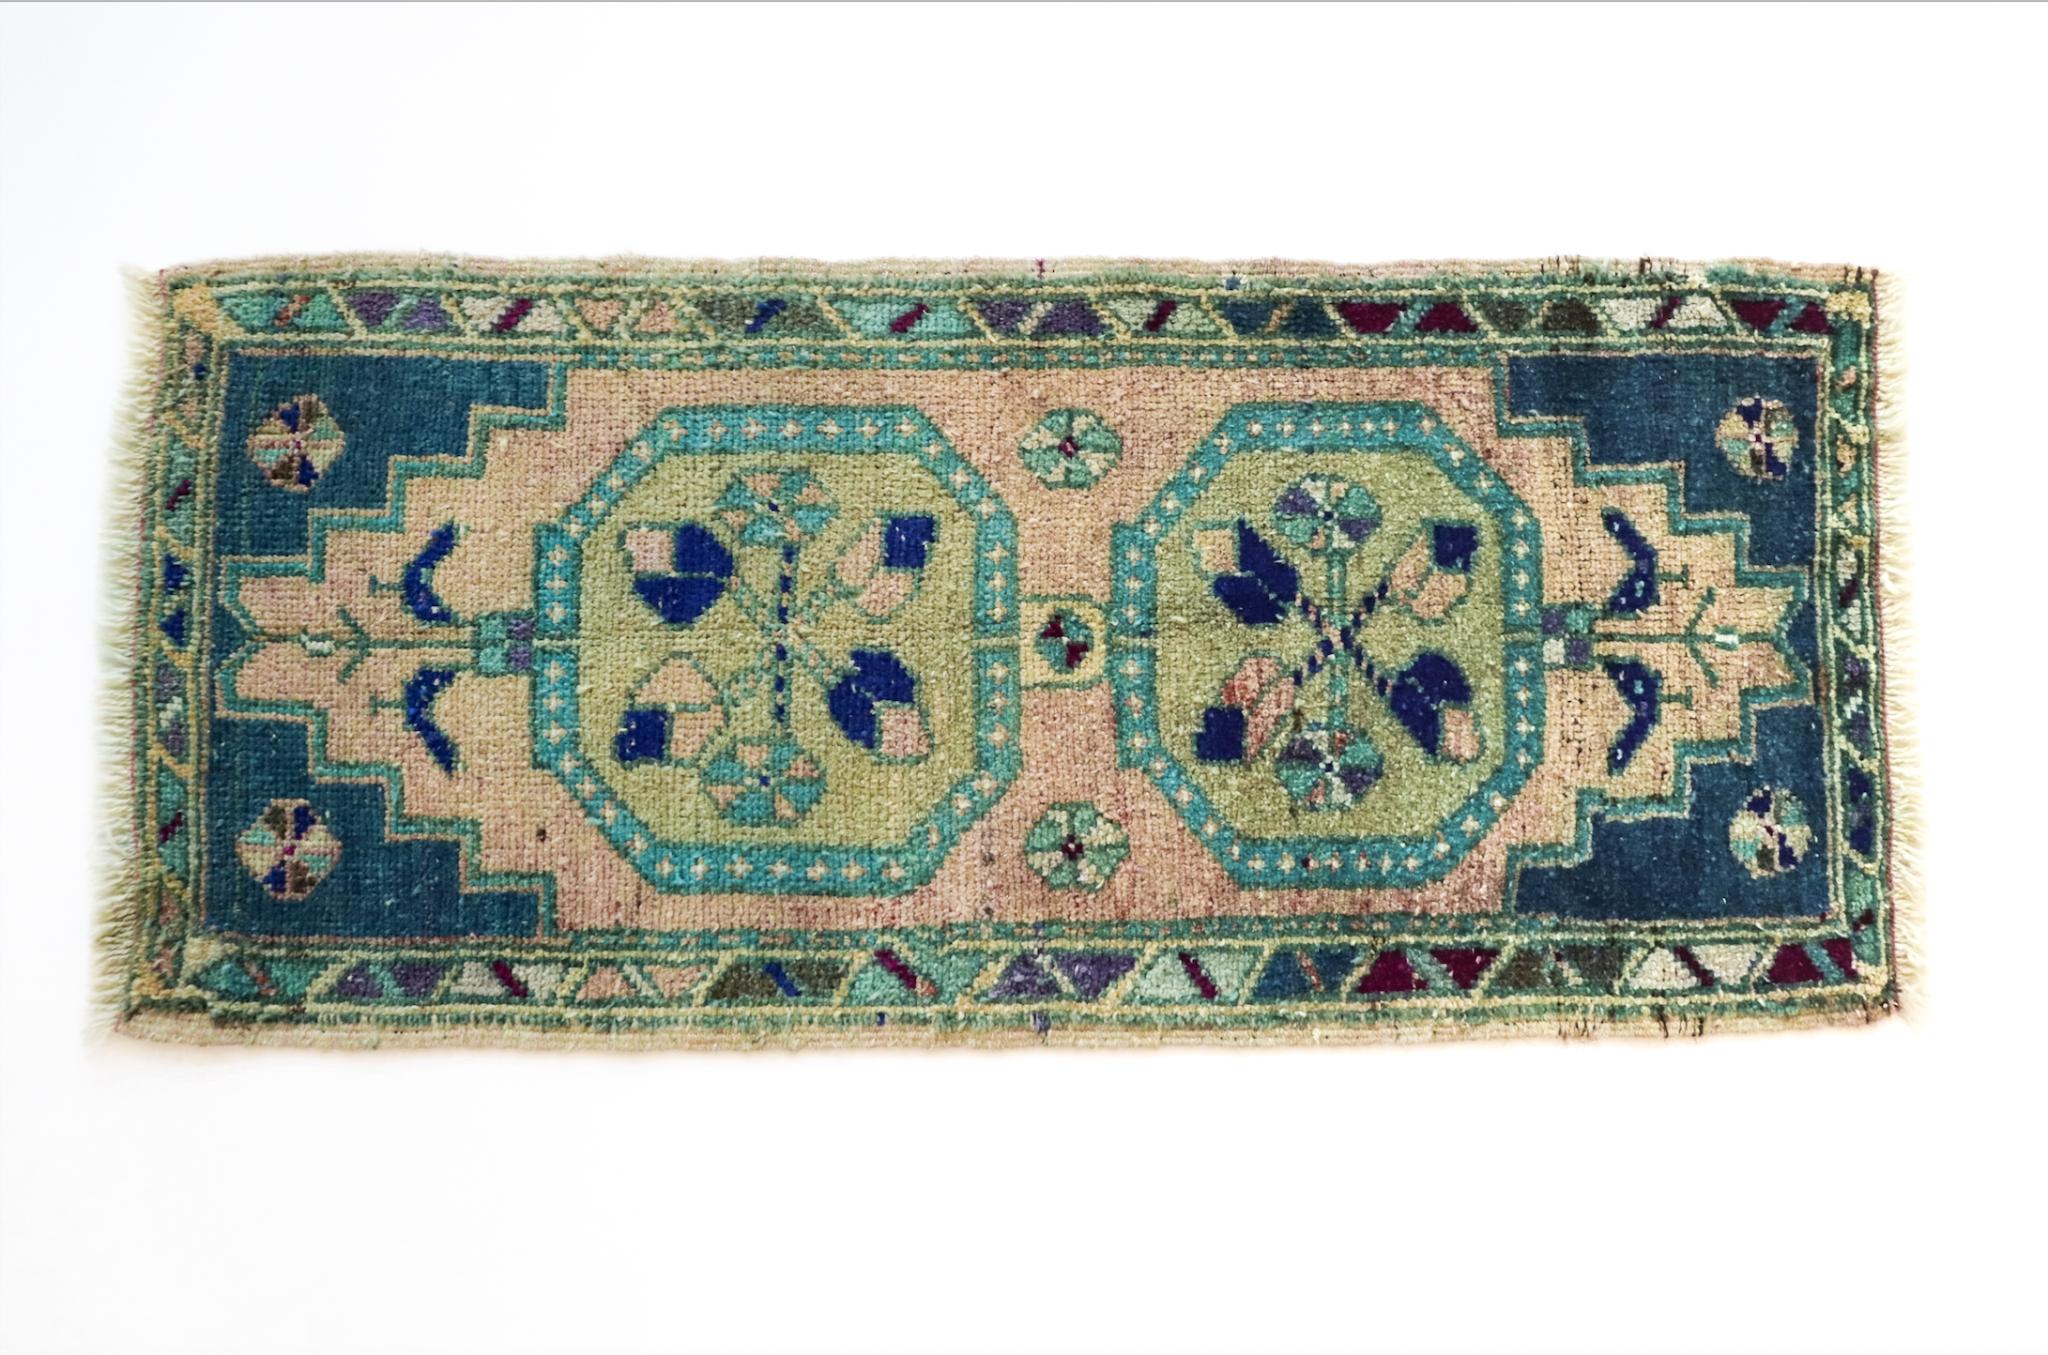 Handmade Vintage Turkish Rug - Blue and Green